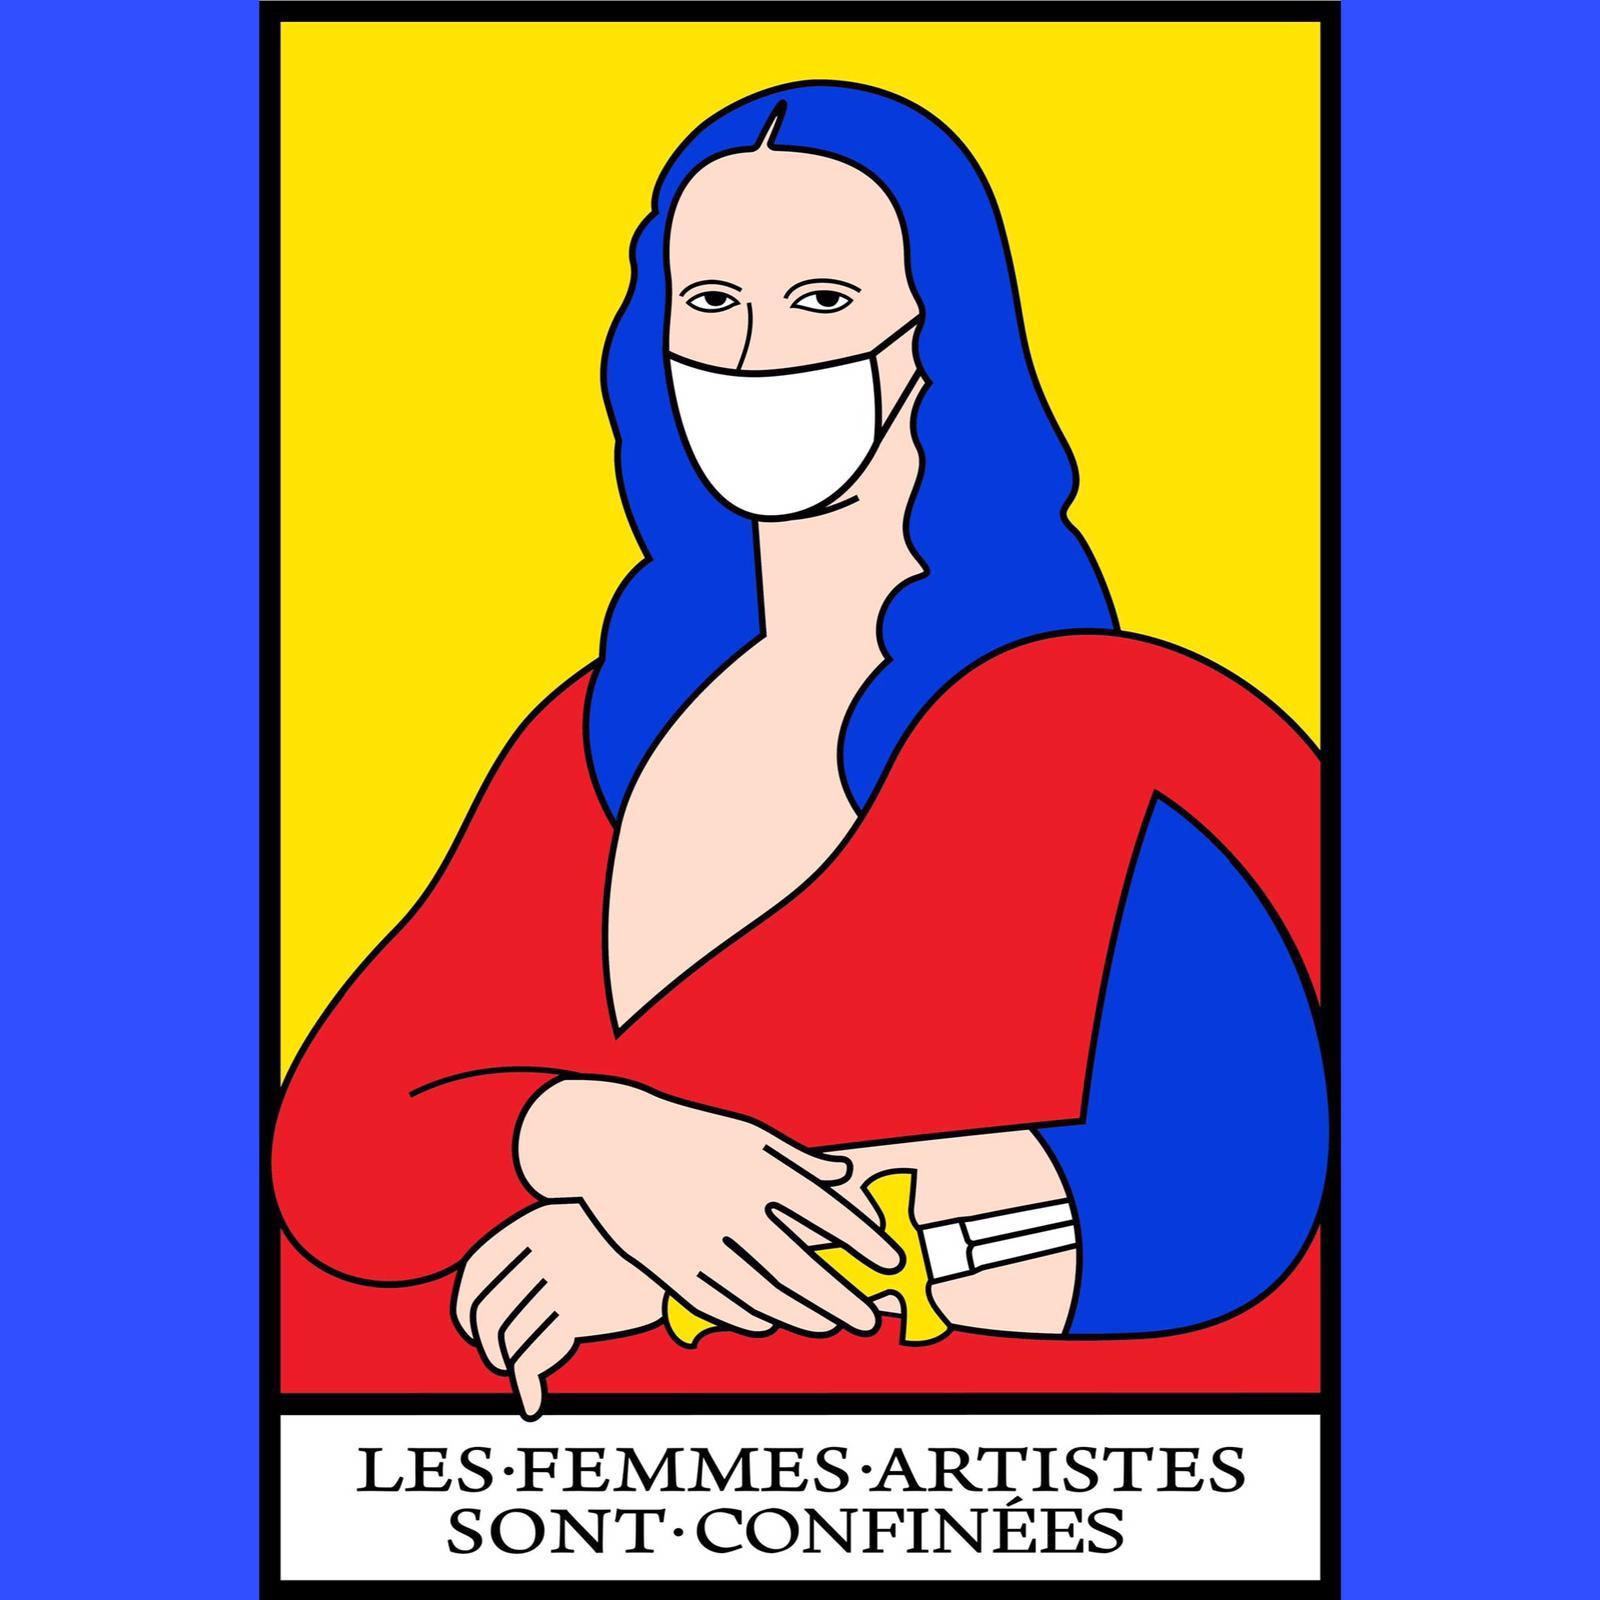 Les Femmes Artistes sont Confinées : Clémence Vazard